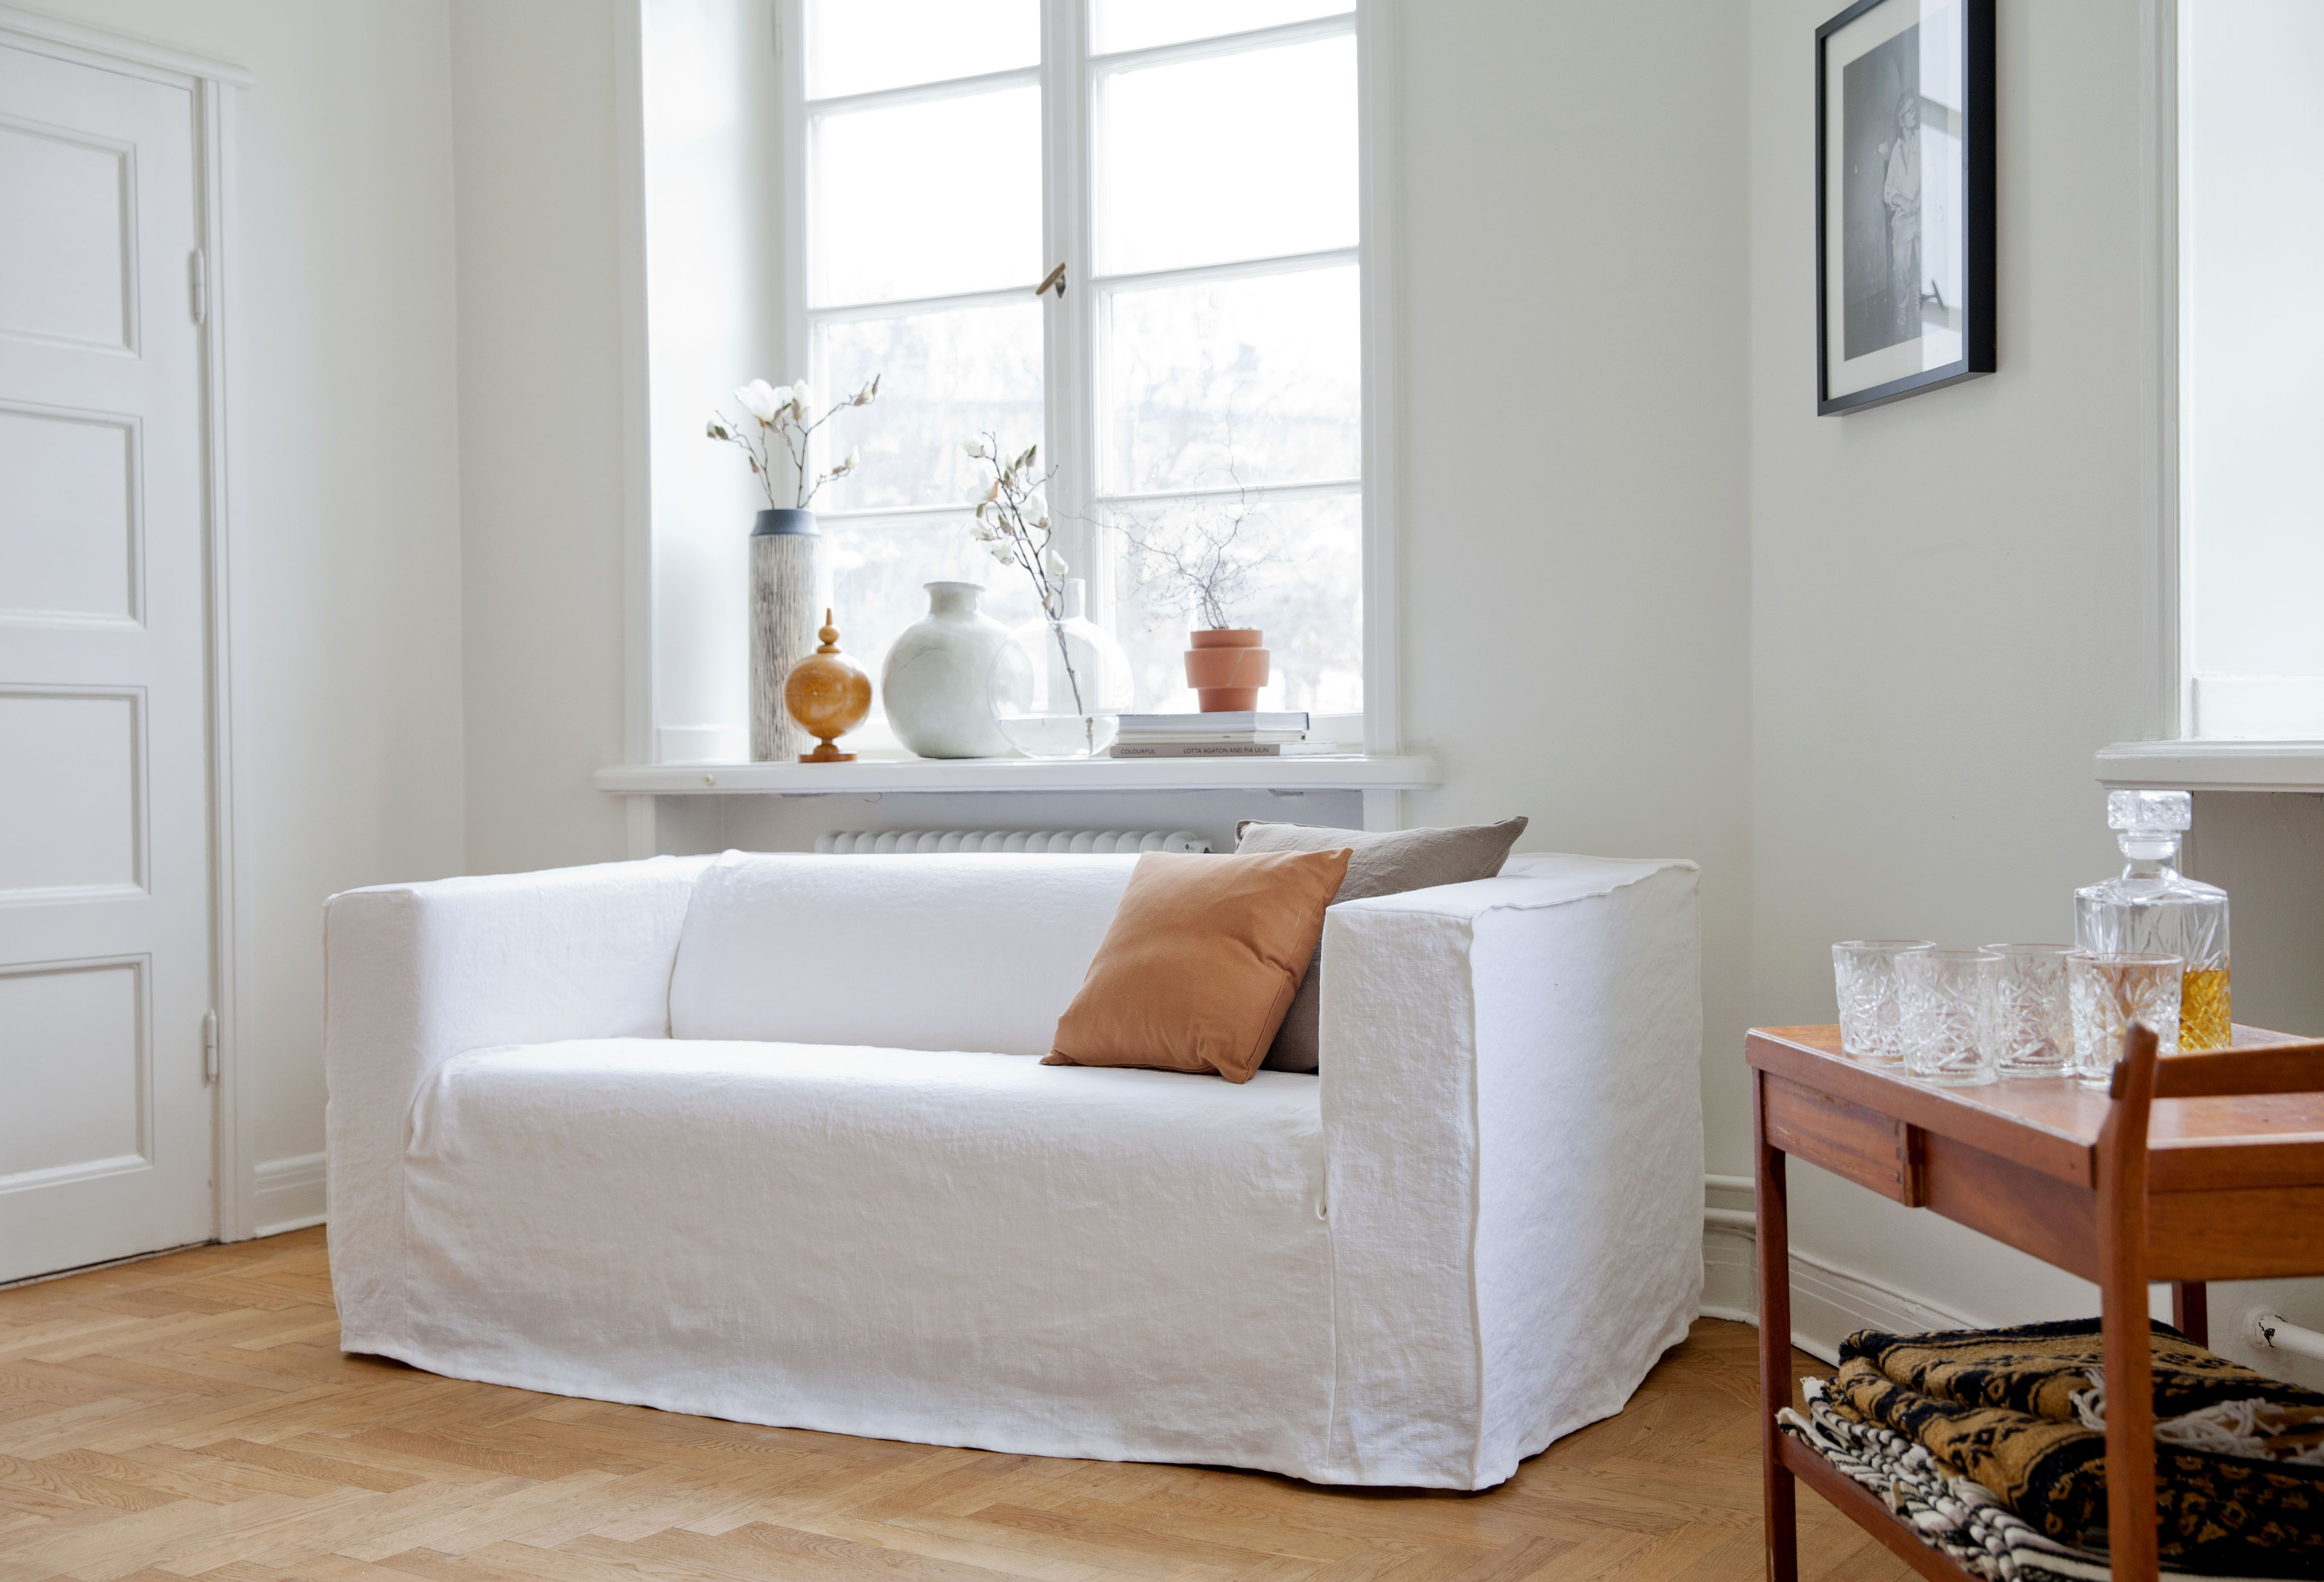 klippan 2 seater sofa cover loose fit urban stitch pinterest wunschlisten und kind. Black Bedroom Furniture Sets. Home Design Ideas